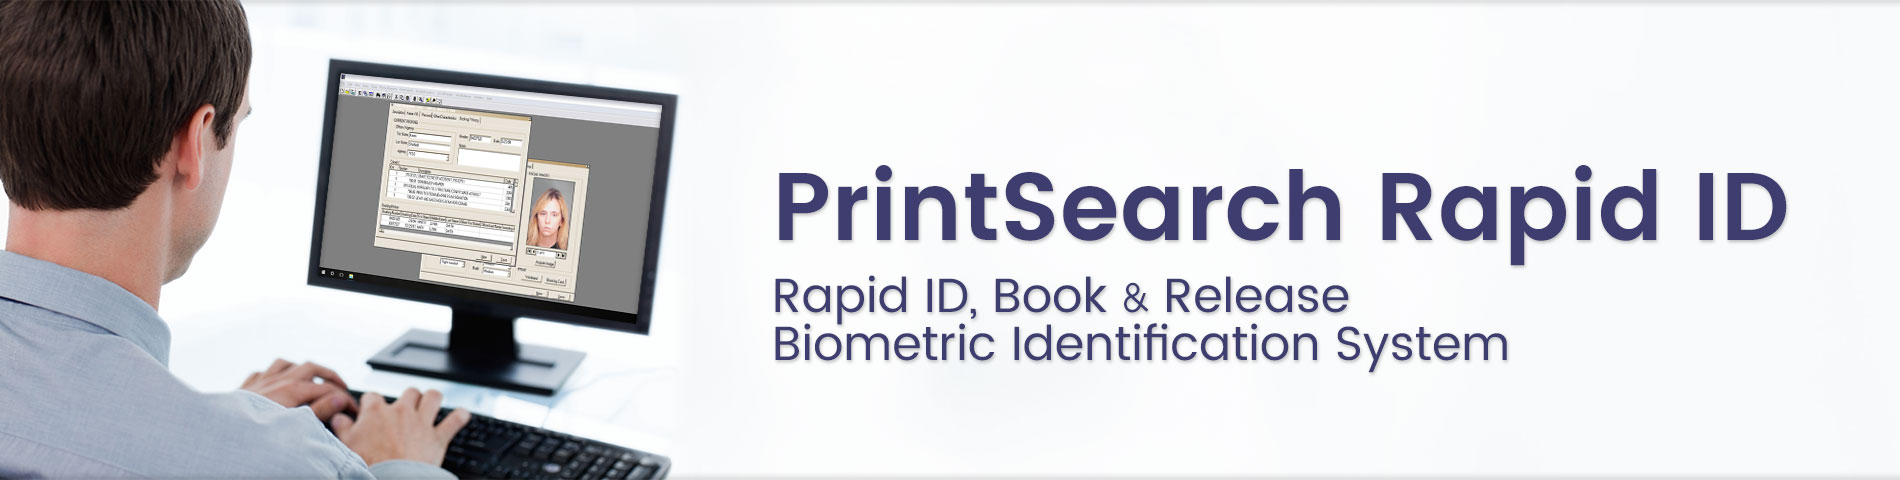 PrintSearch Rapid ID